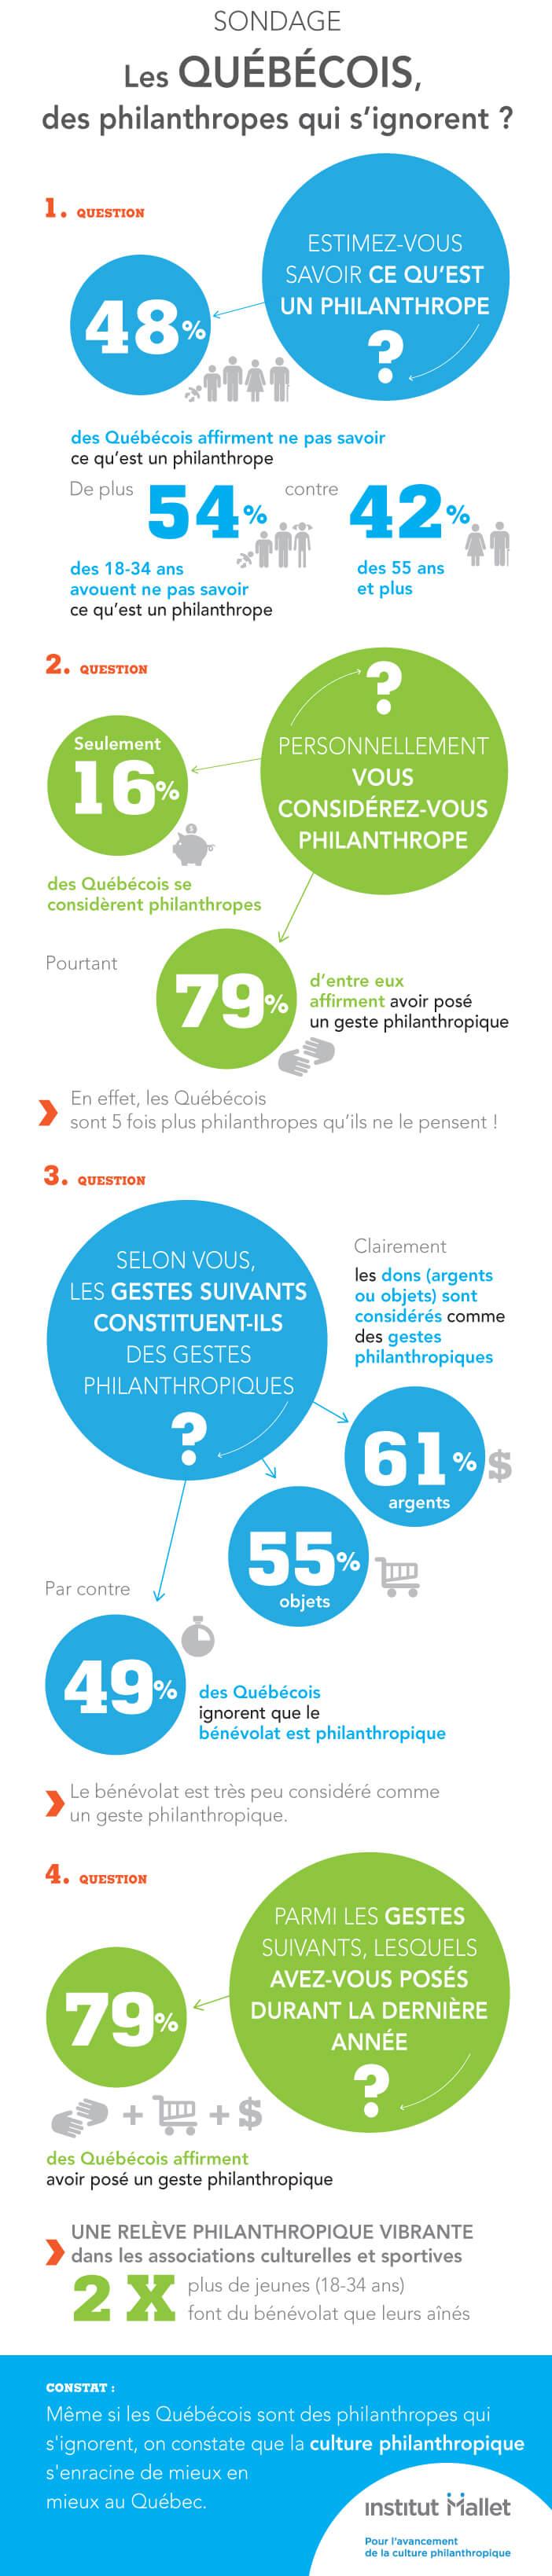 infographie_sondage_2016_bq